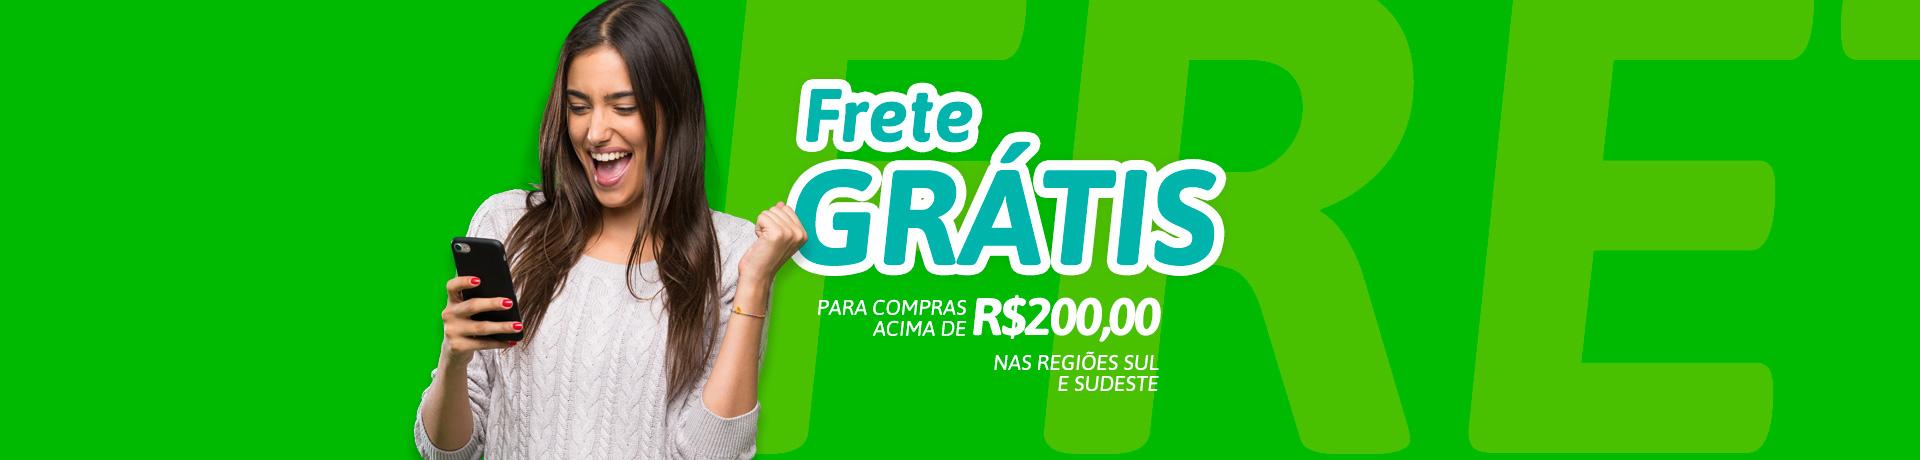 Frete-gratis-20200924